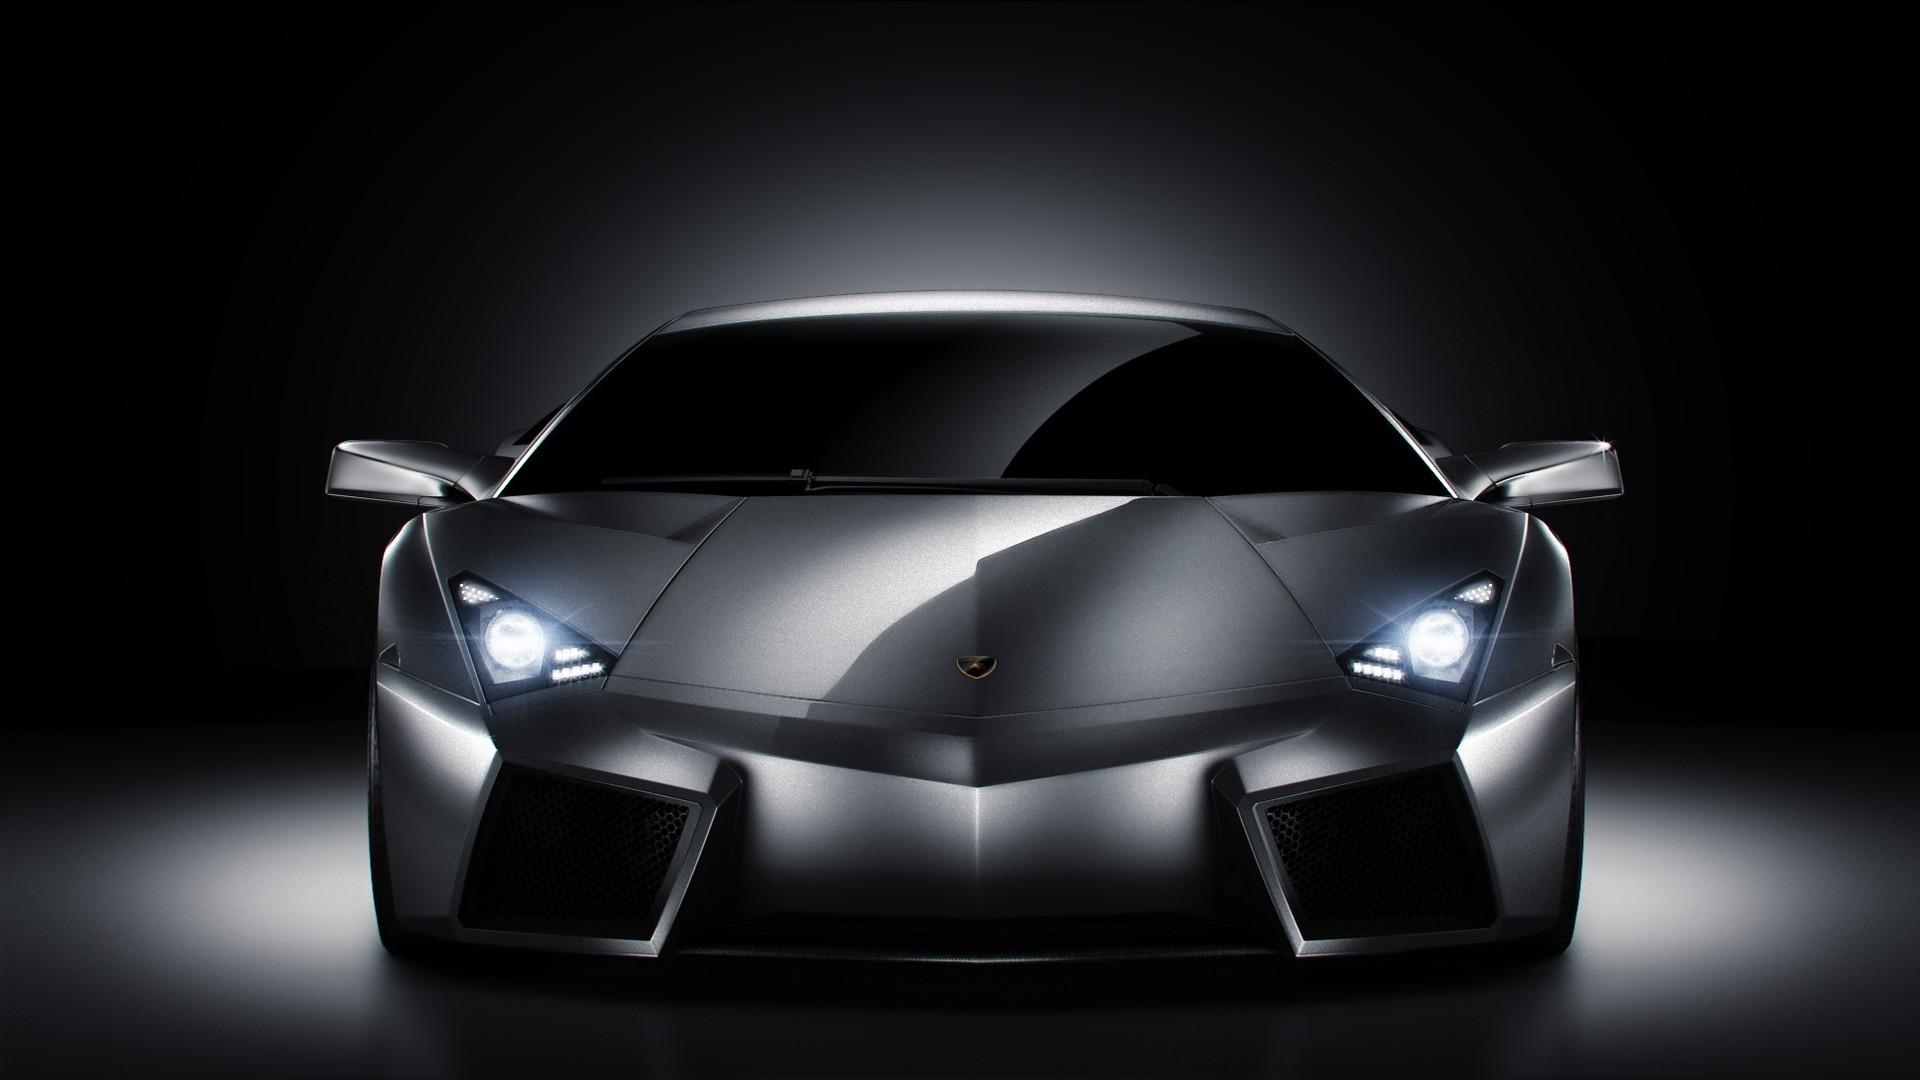 Lamborghini Reventon Silver 3d Wallpaper